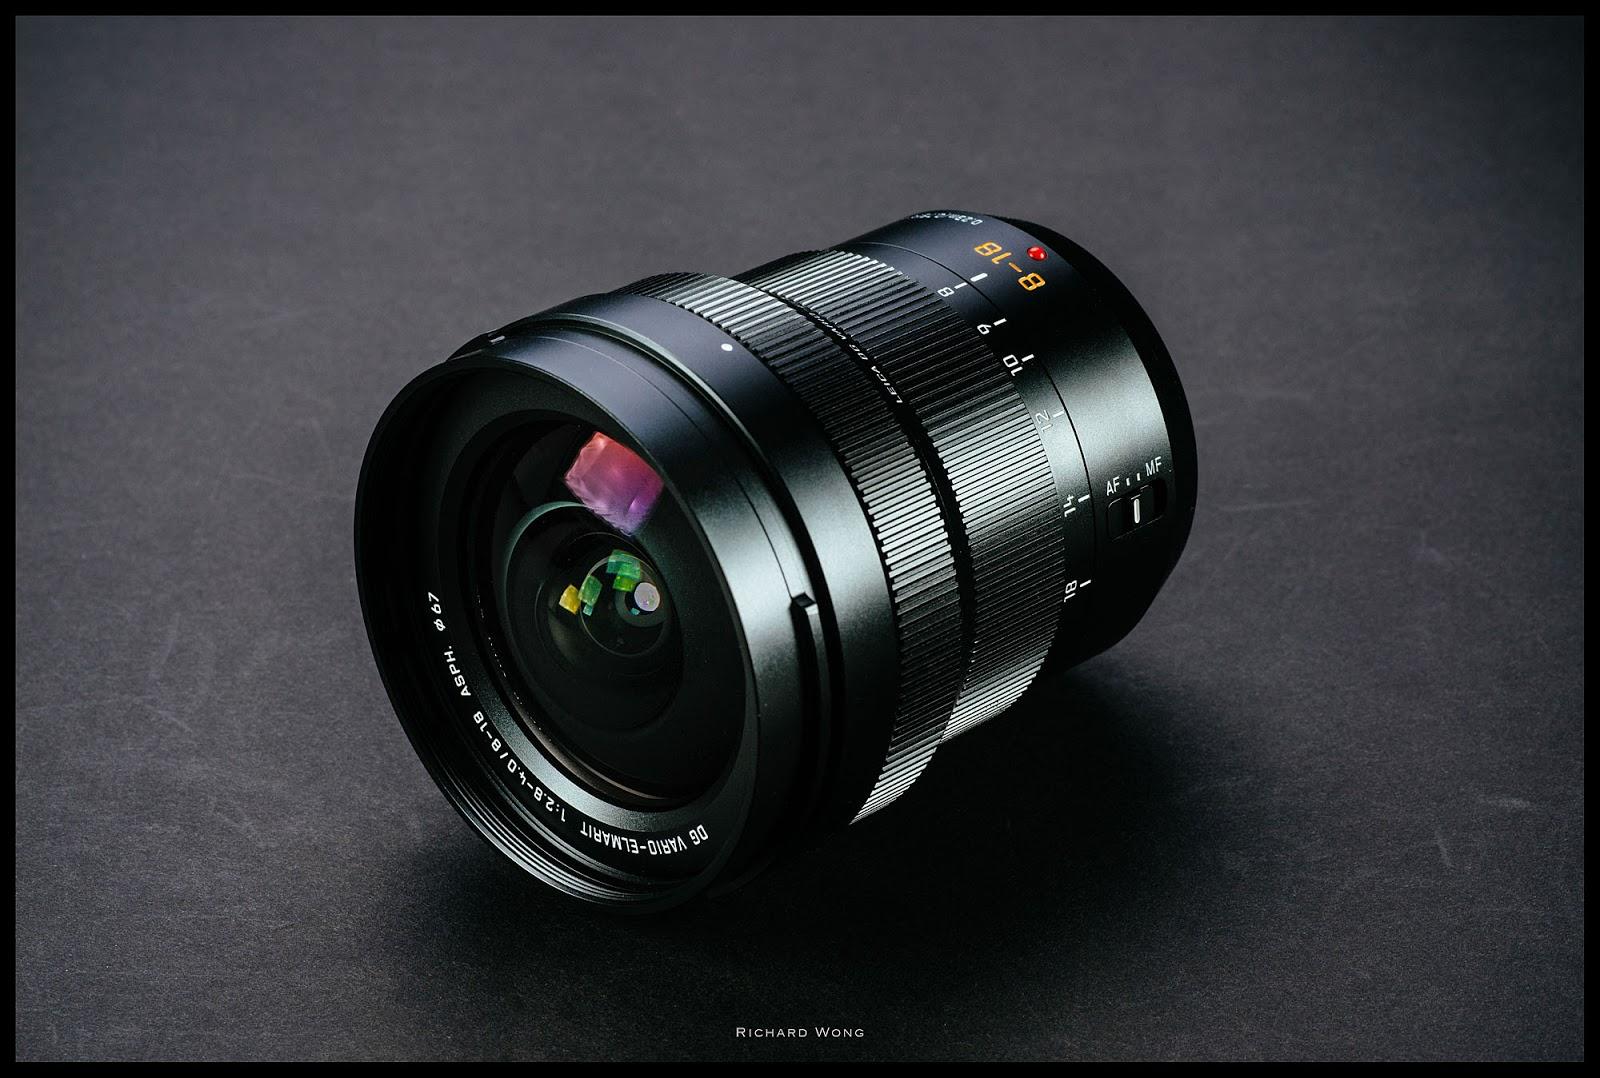 Leica DG Vario-Elmarit 8-18mm f/2.8-4.0 Asph